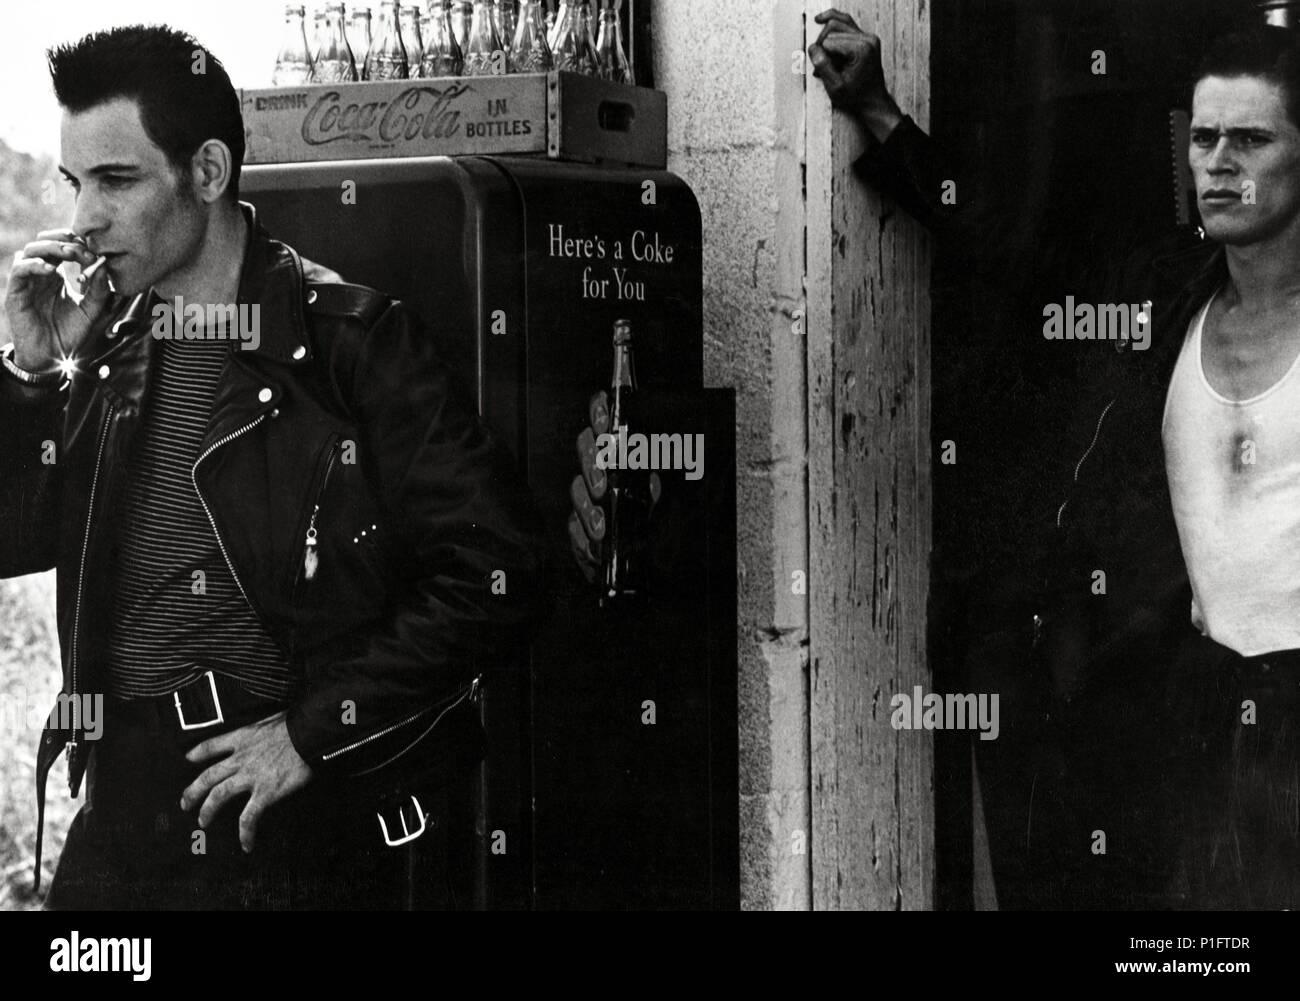 Original Film Title: THE LOVELESS.  English Title: THE LOVELESS.  Film Director: KATHRYN BIGELOW.  Year: 1982.  Stars: WILLEM DAFOE; ROBERT GORDON. Credit: PIONEER PICTURES / Album - Stock Image